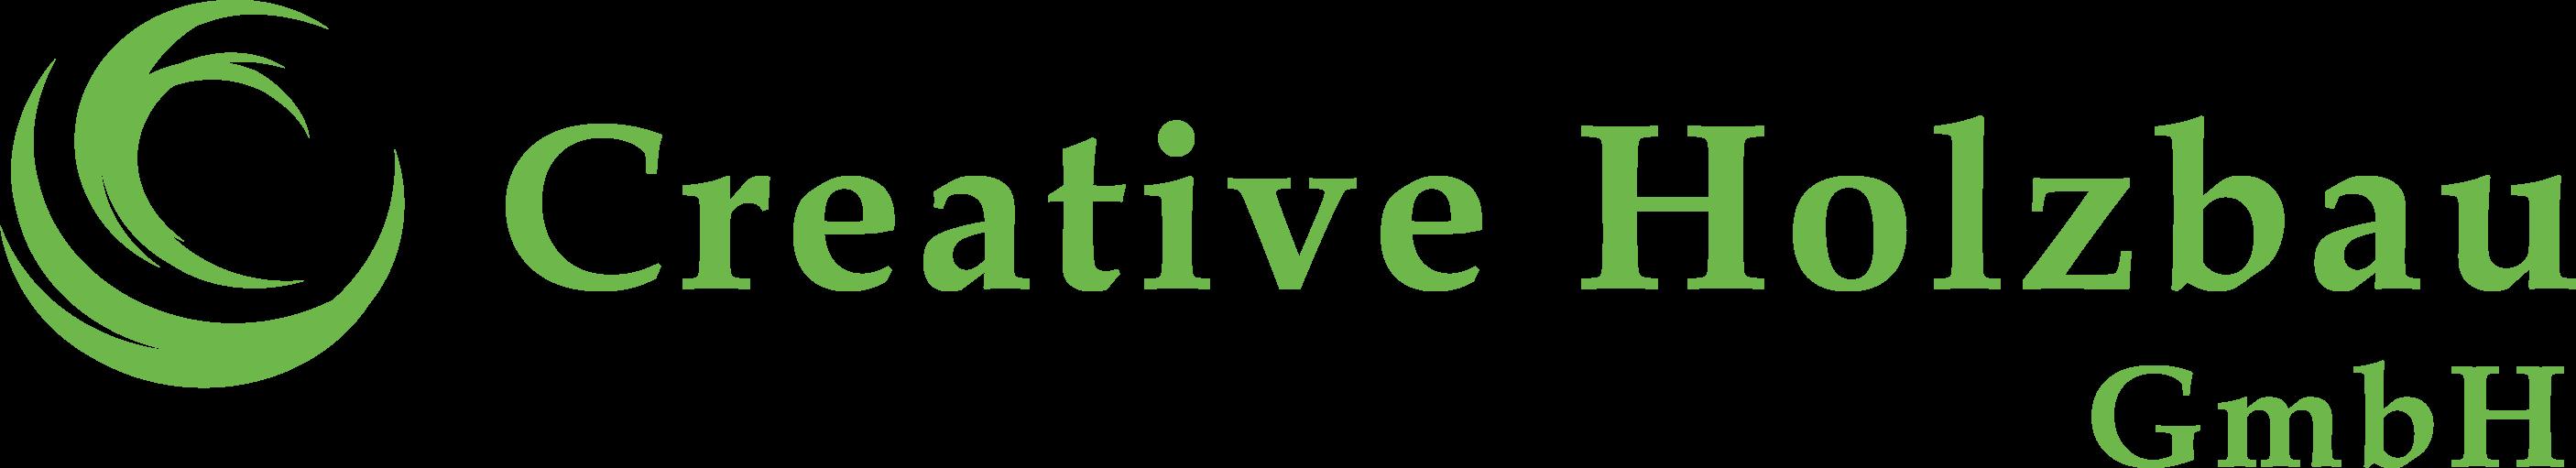 CreativeHolzbau